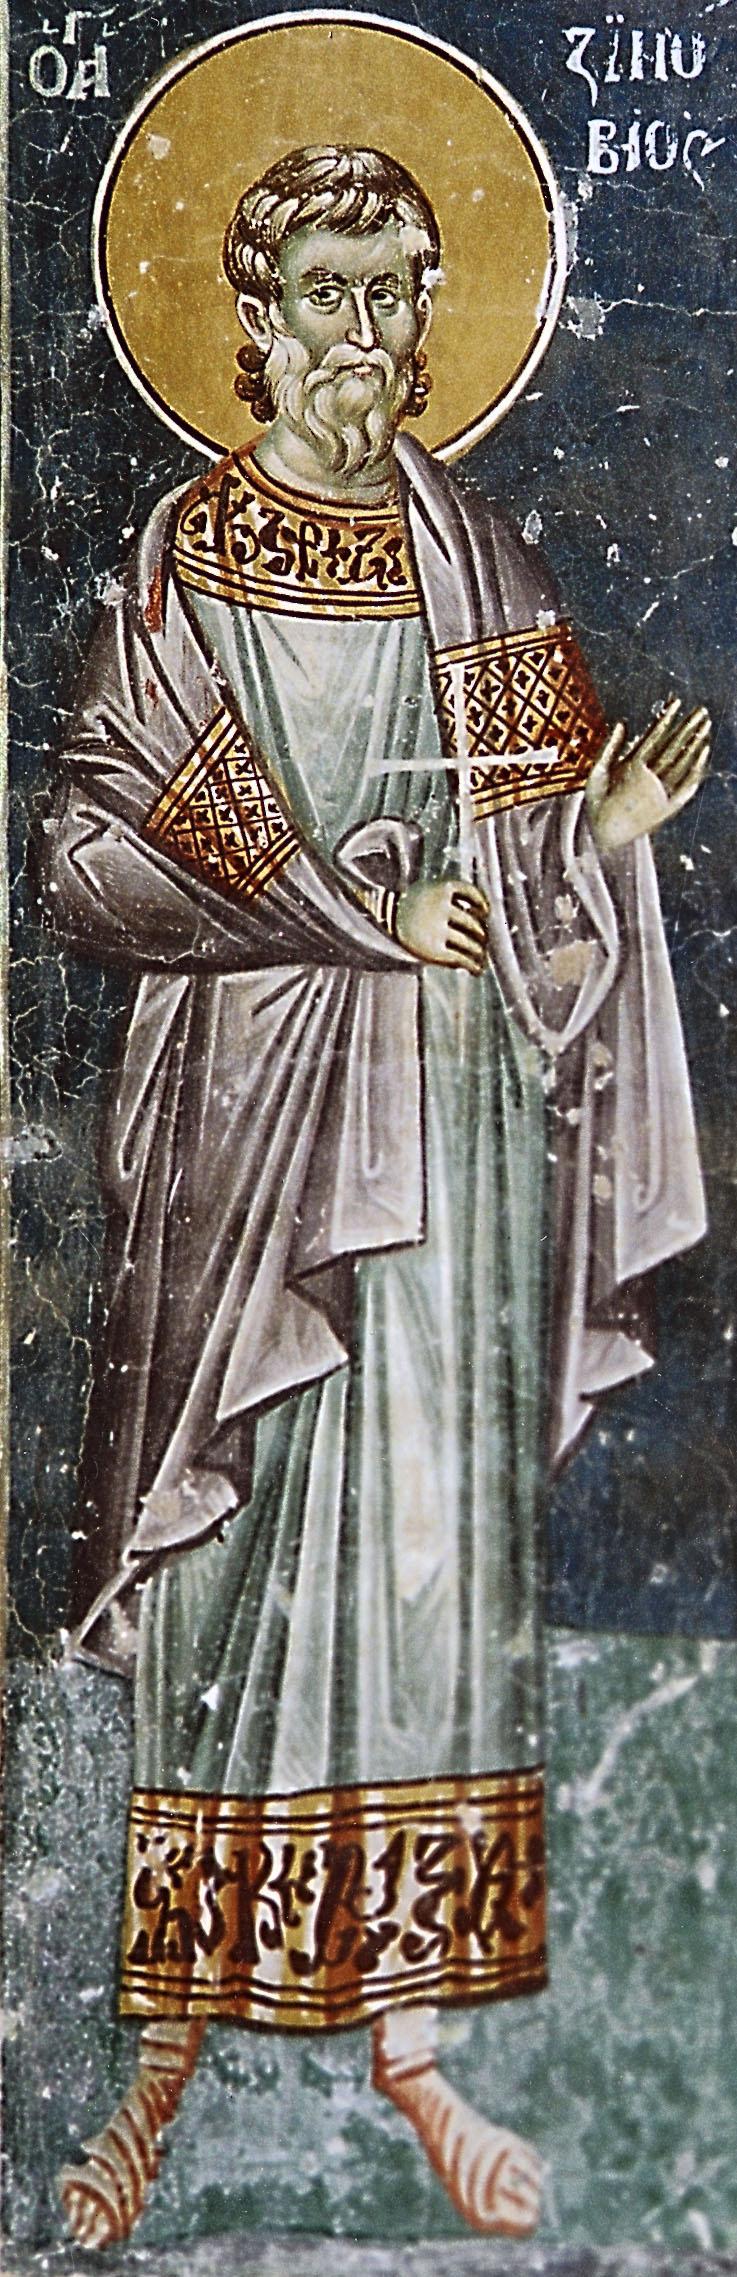 Saint Zénobe